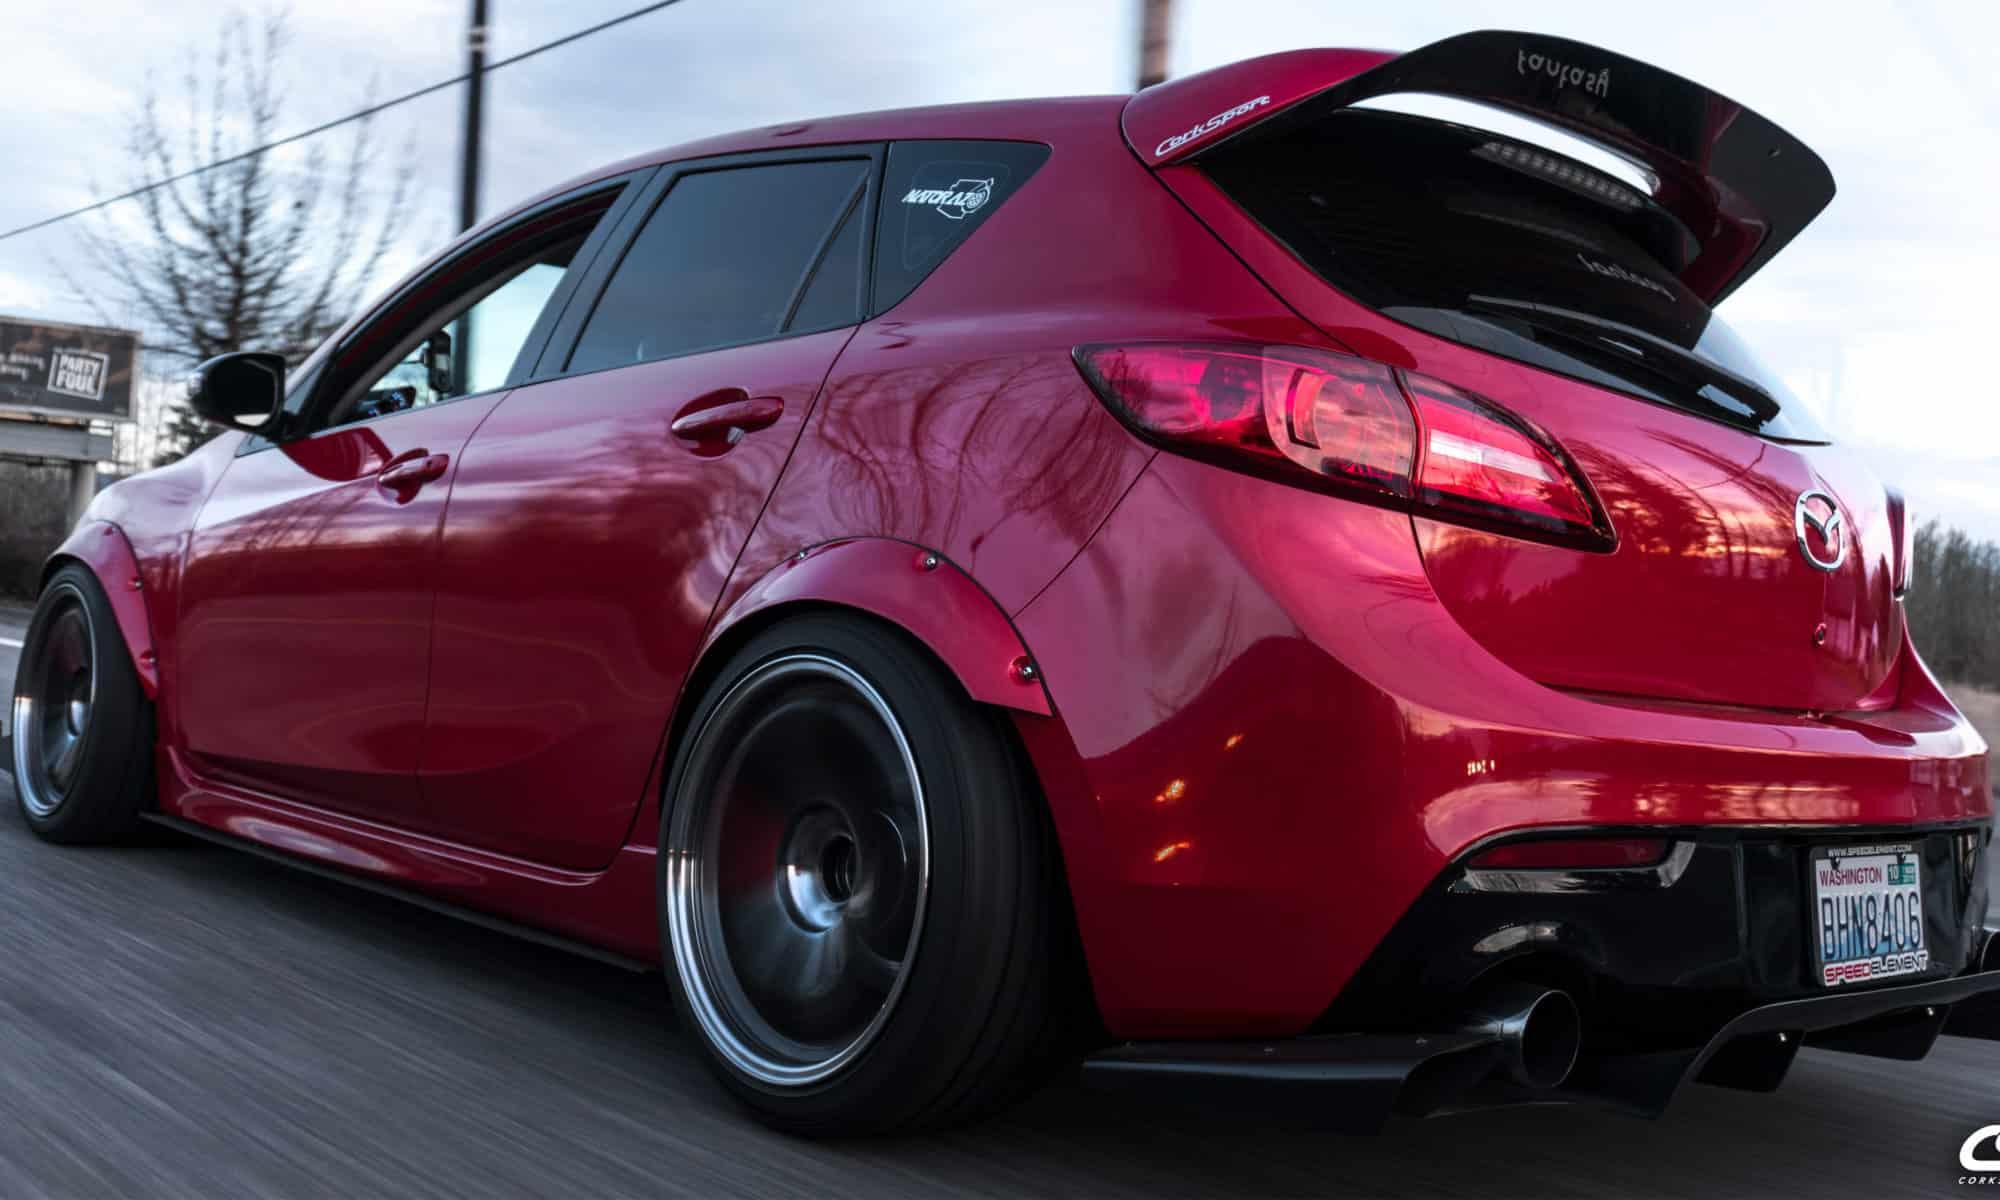 Brett's Mazdaspeed 3 Build